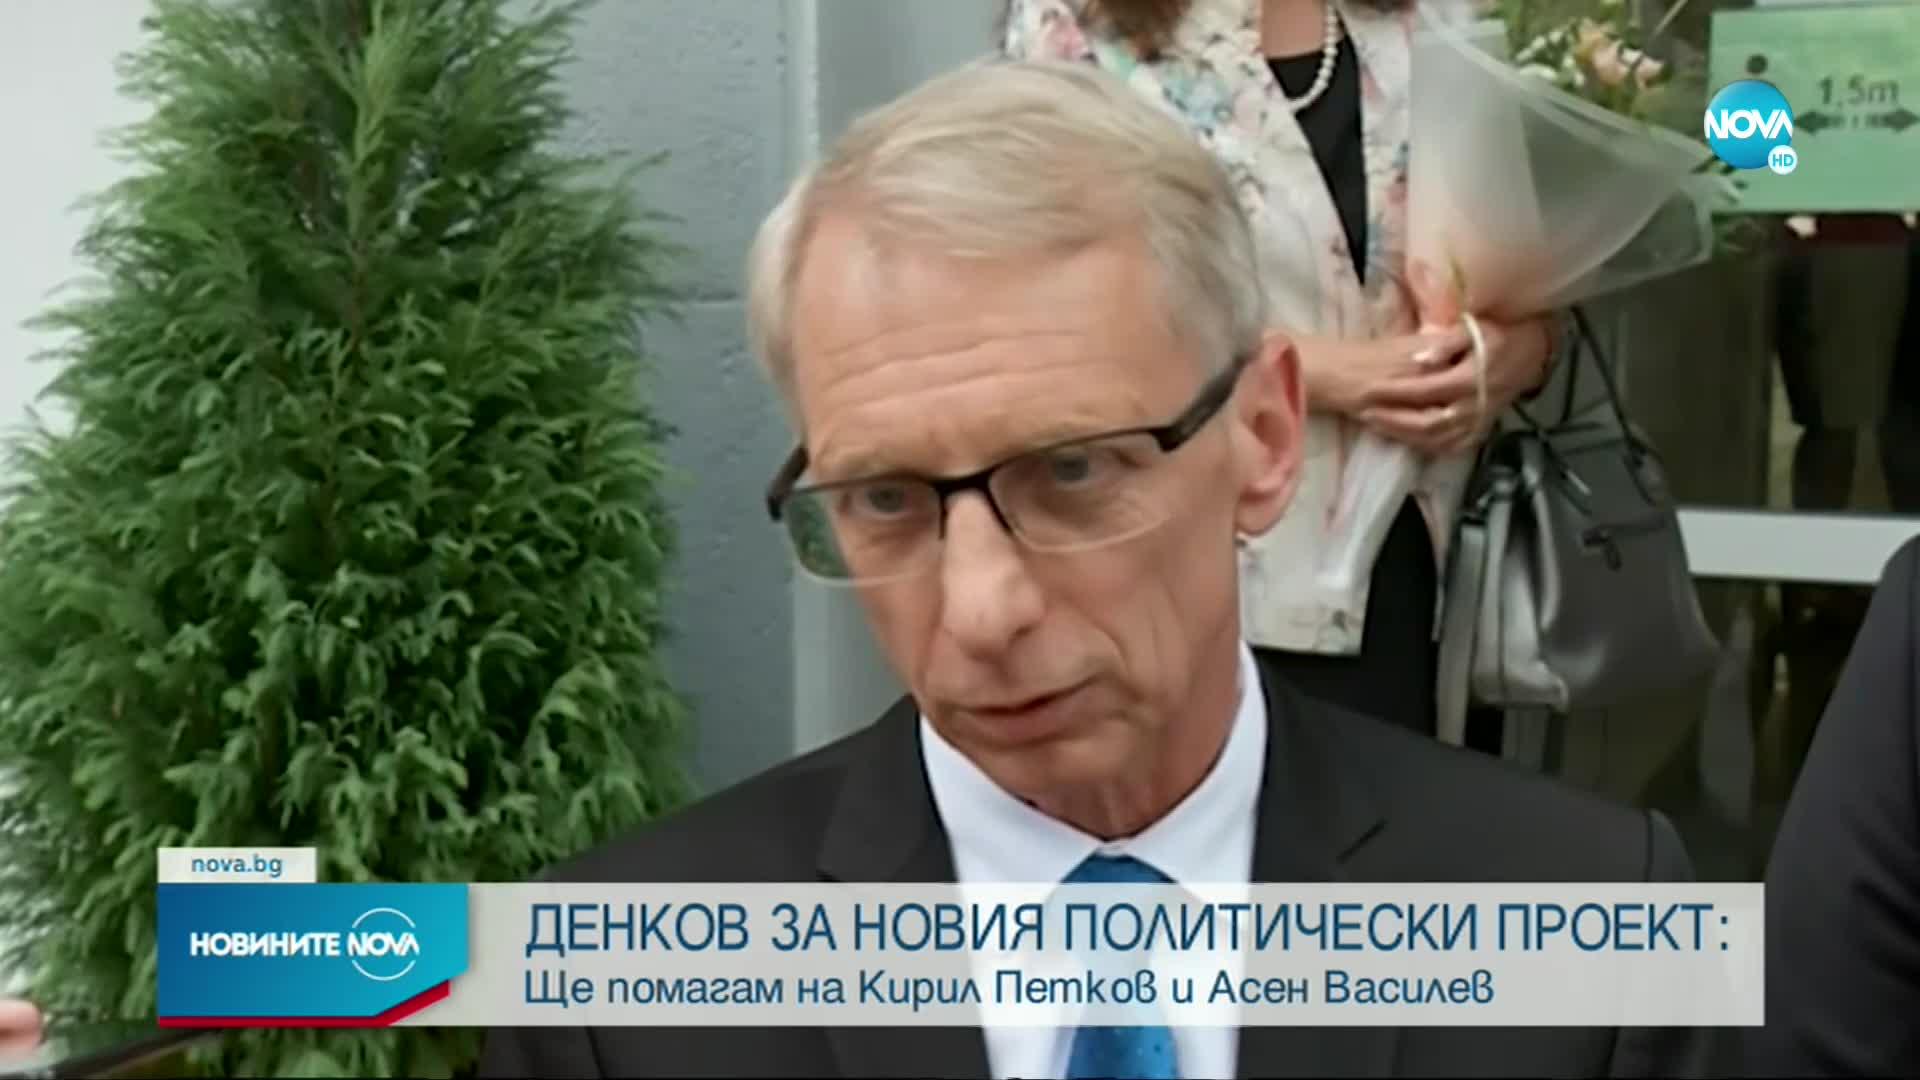 Денков: Ще помагам на Петков и Василев